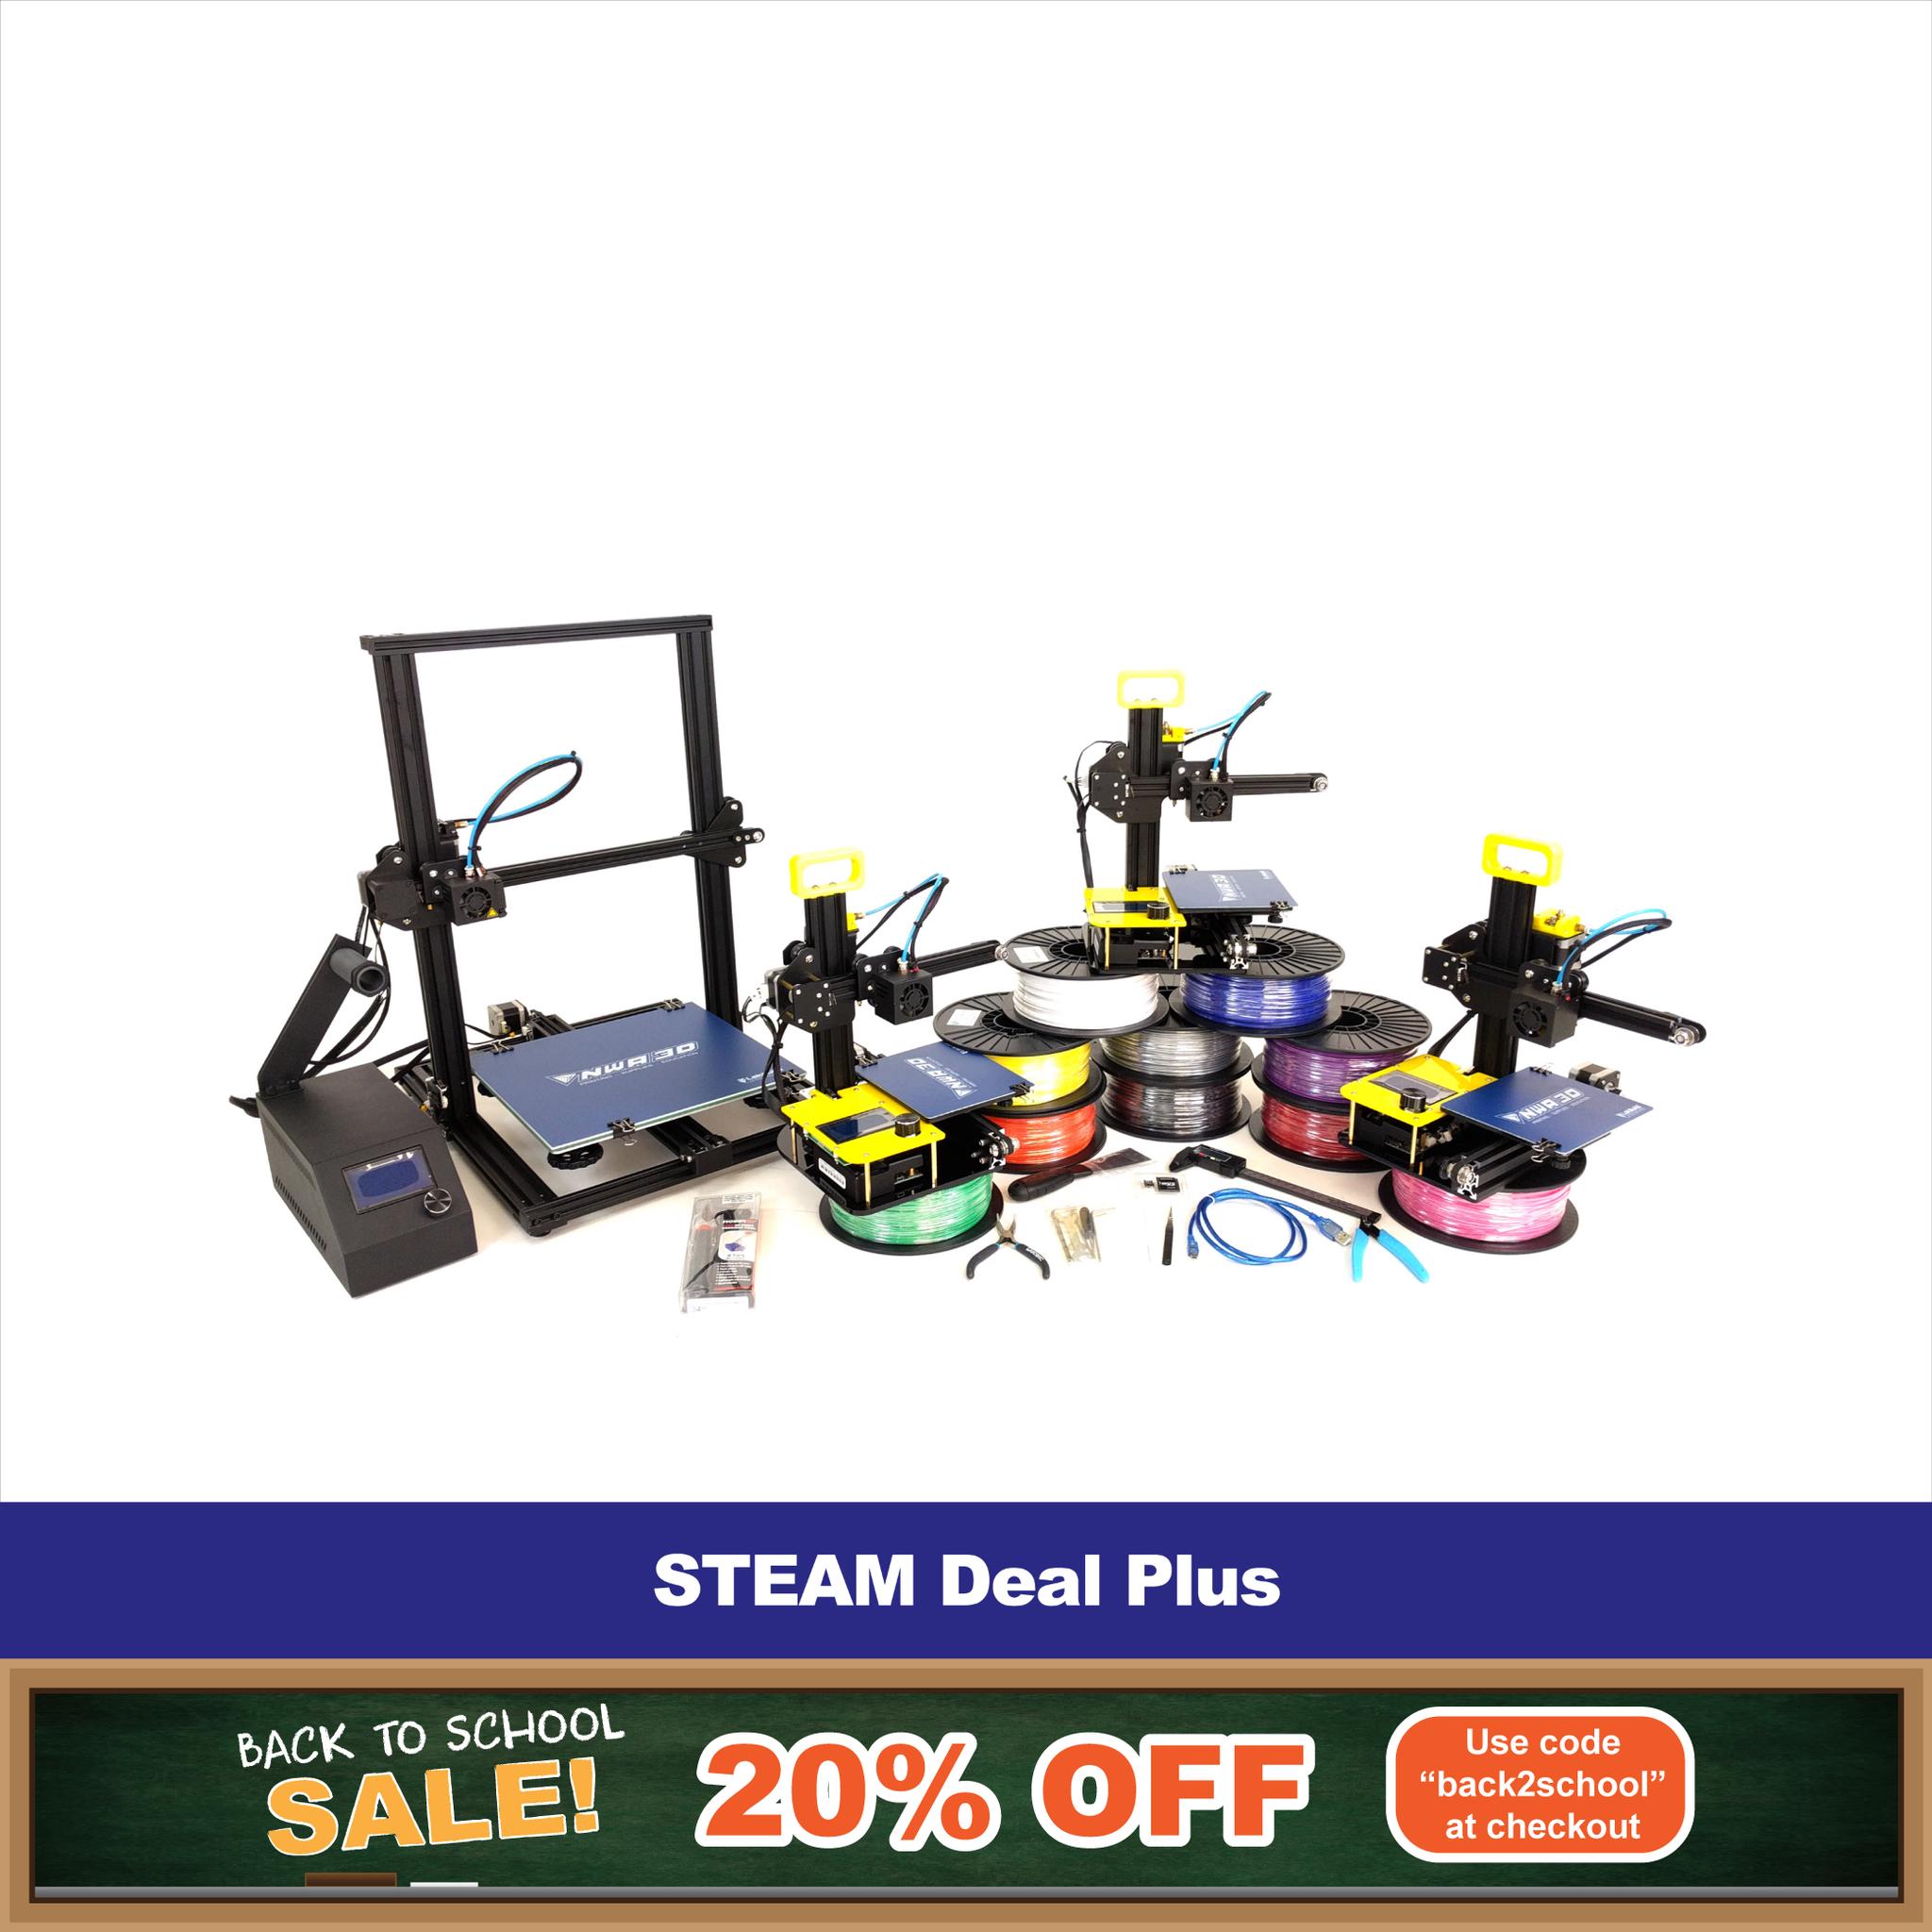 STEAM Deal Plus 20% Off